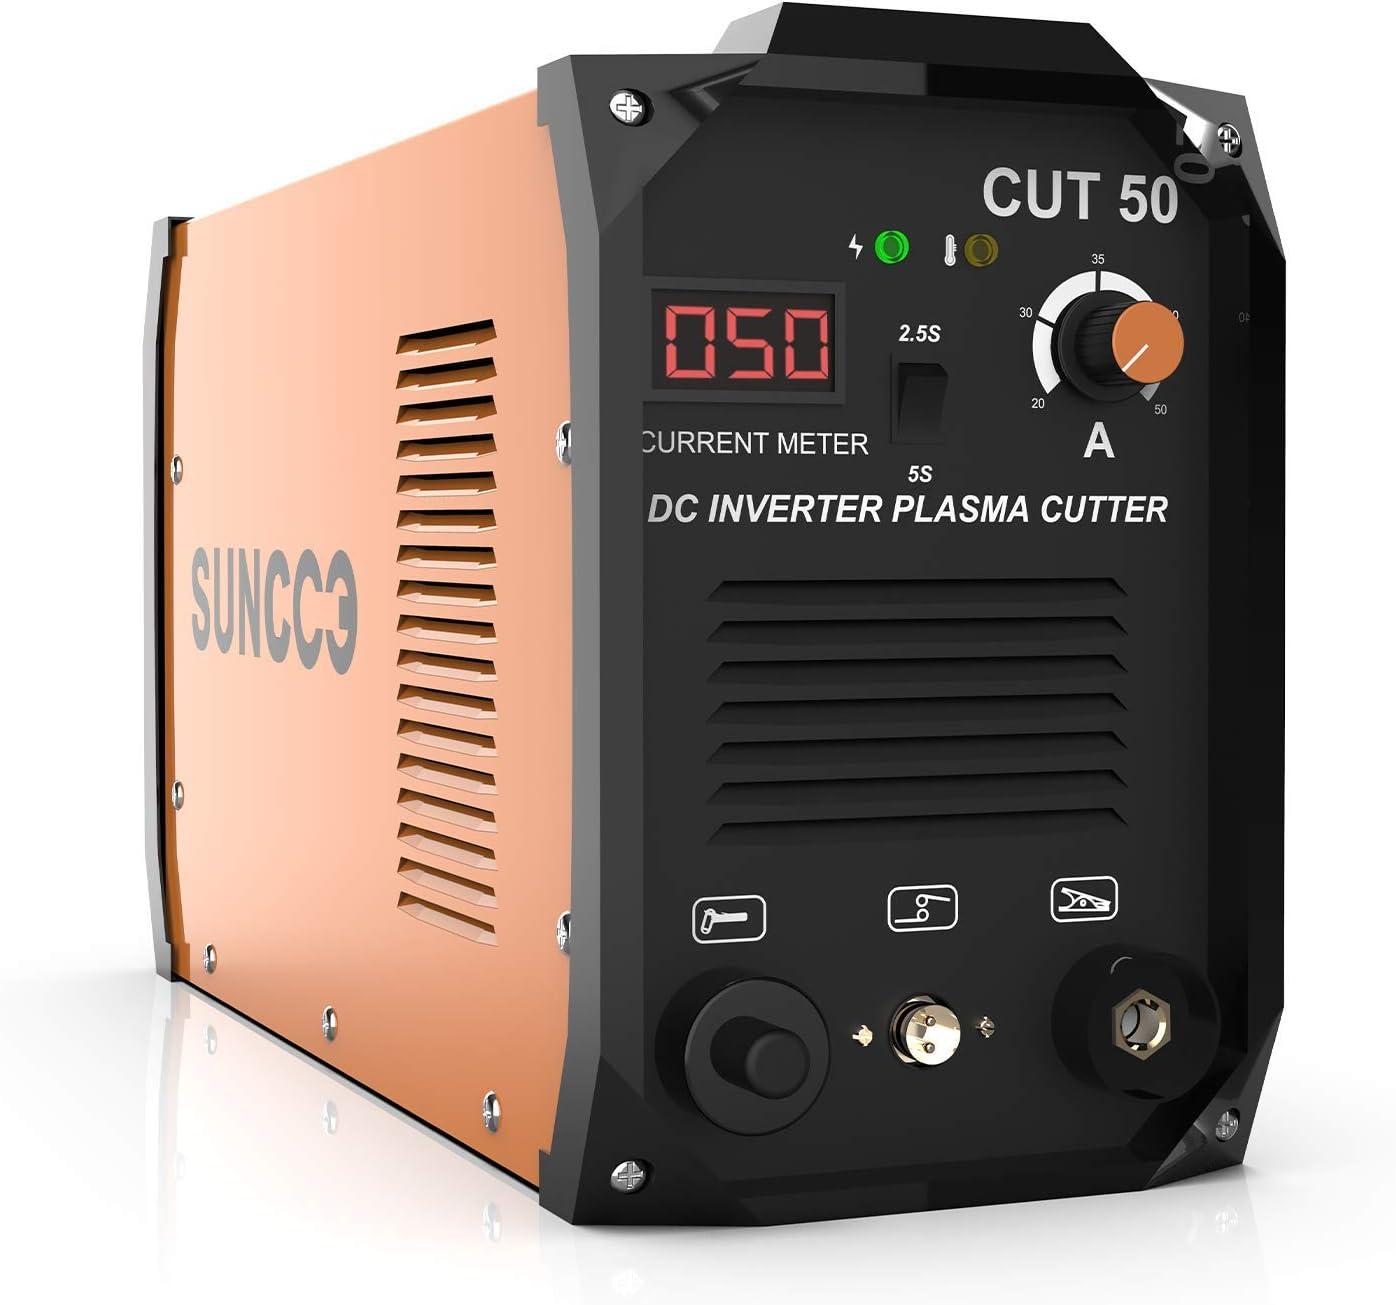 SUNCOO CUT50 Plasma Cutter – Best for Power-Efficiency